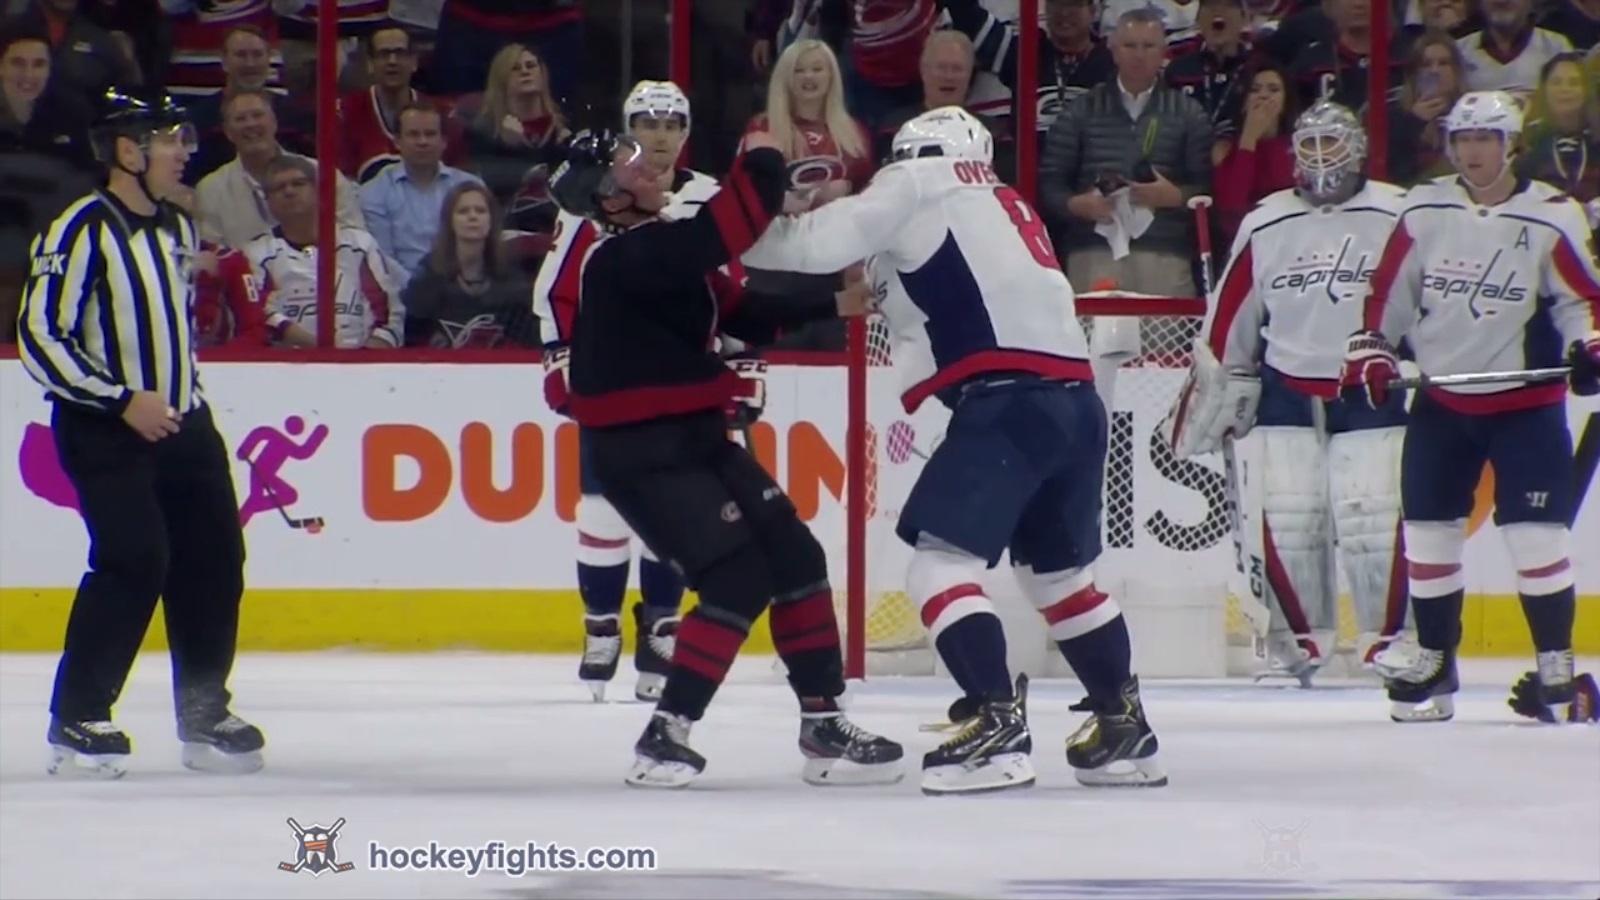 Nhl Fight Videos Hockey Fights